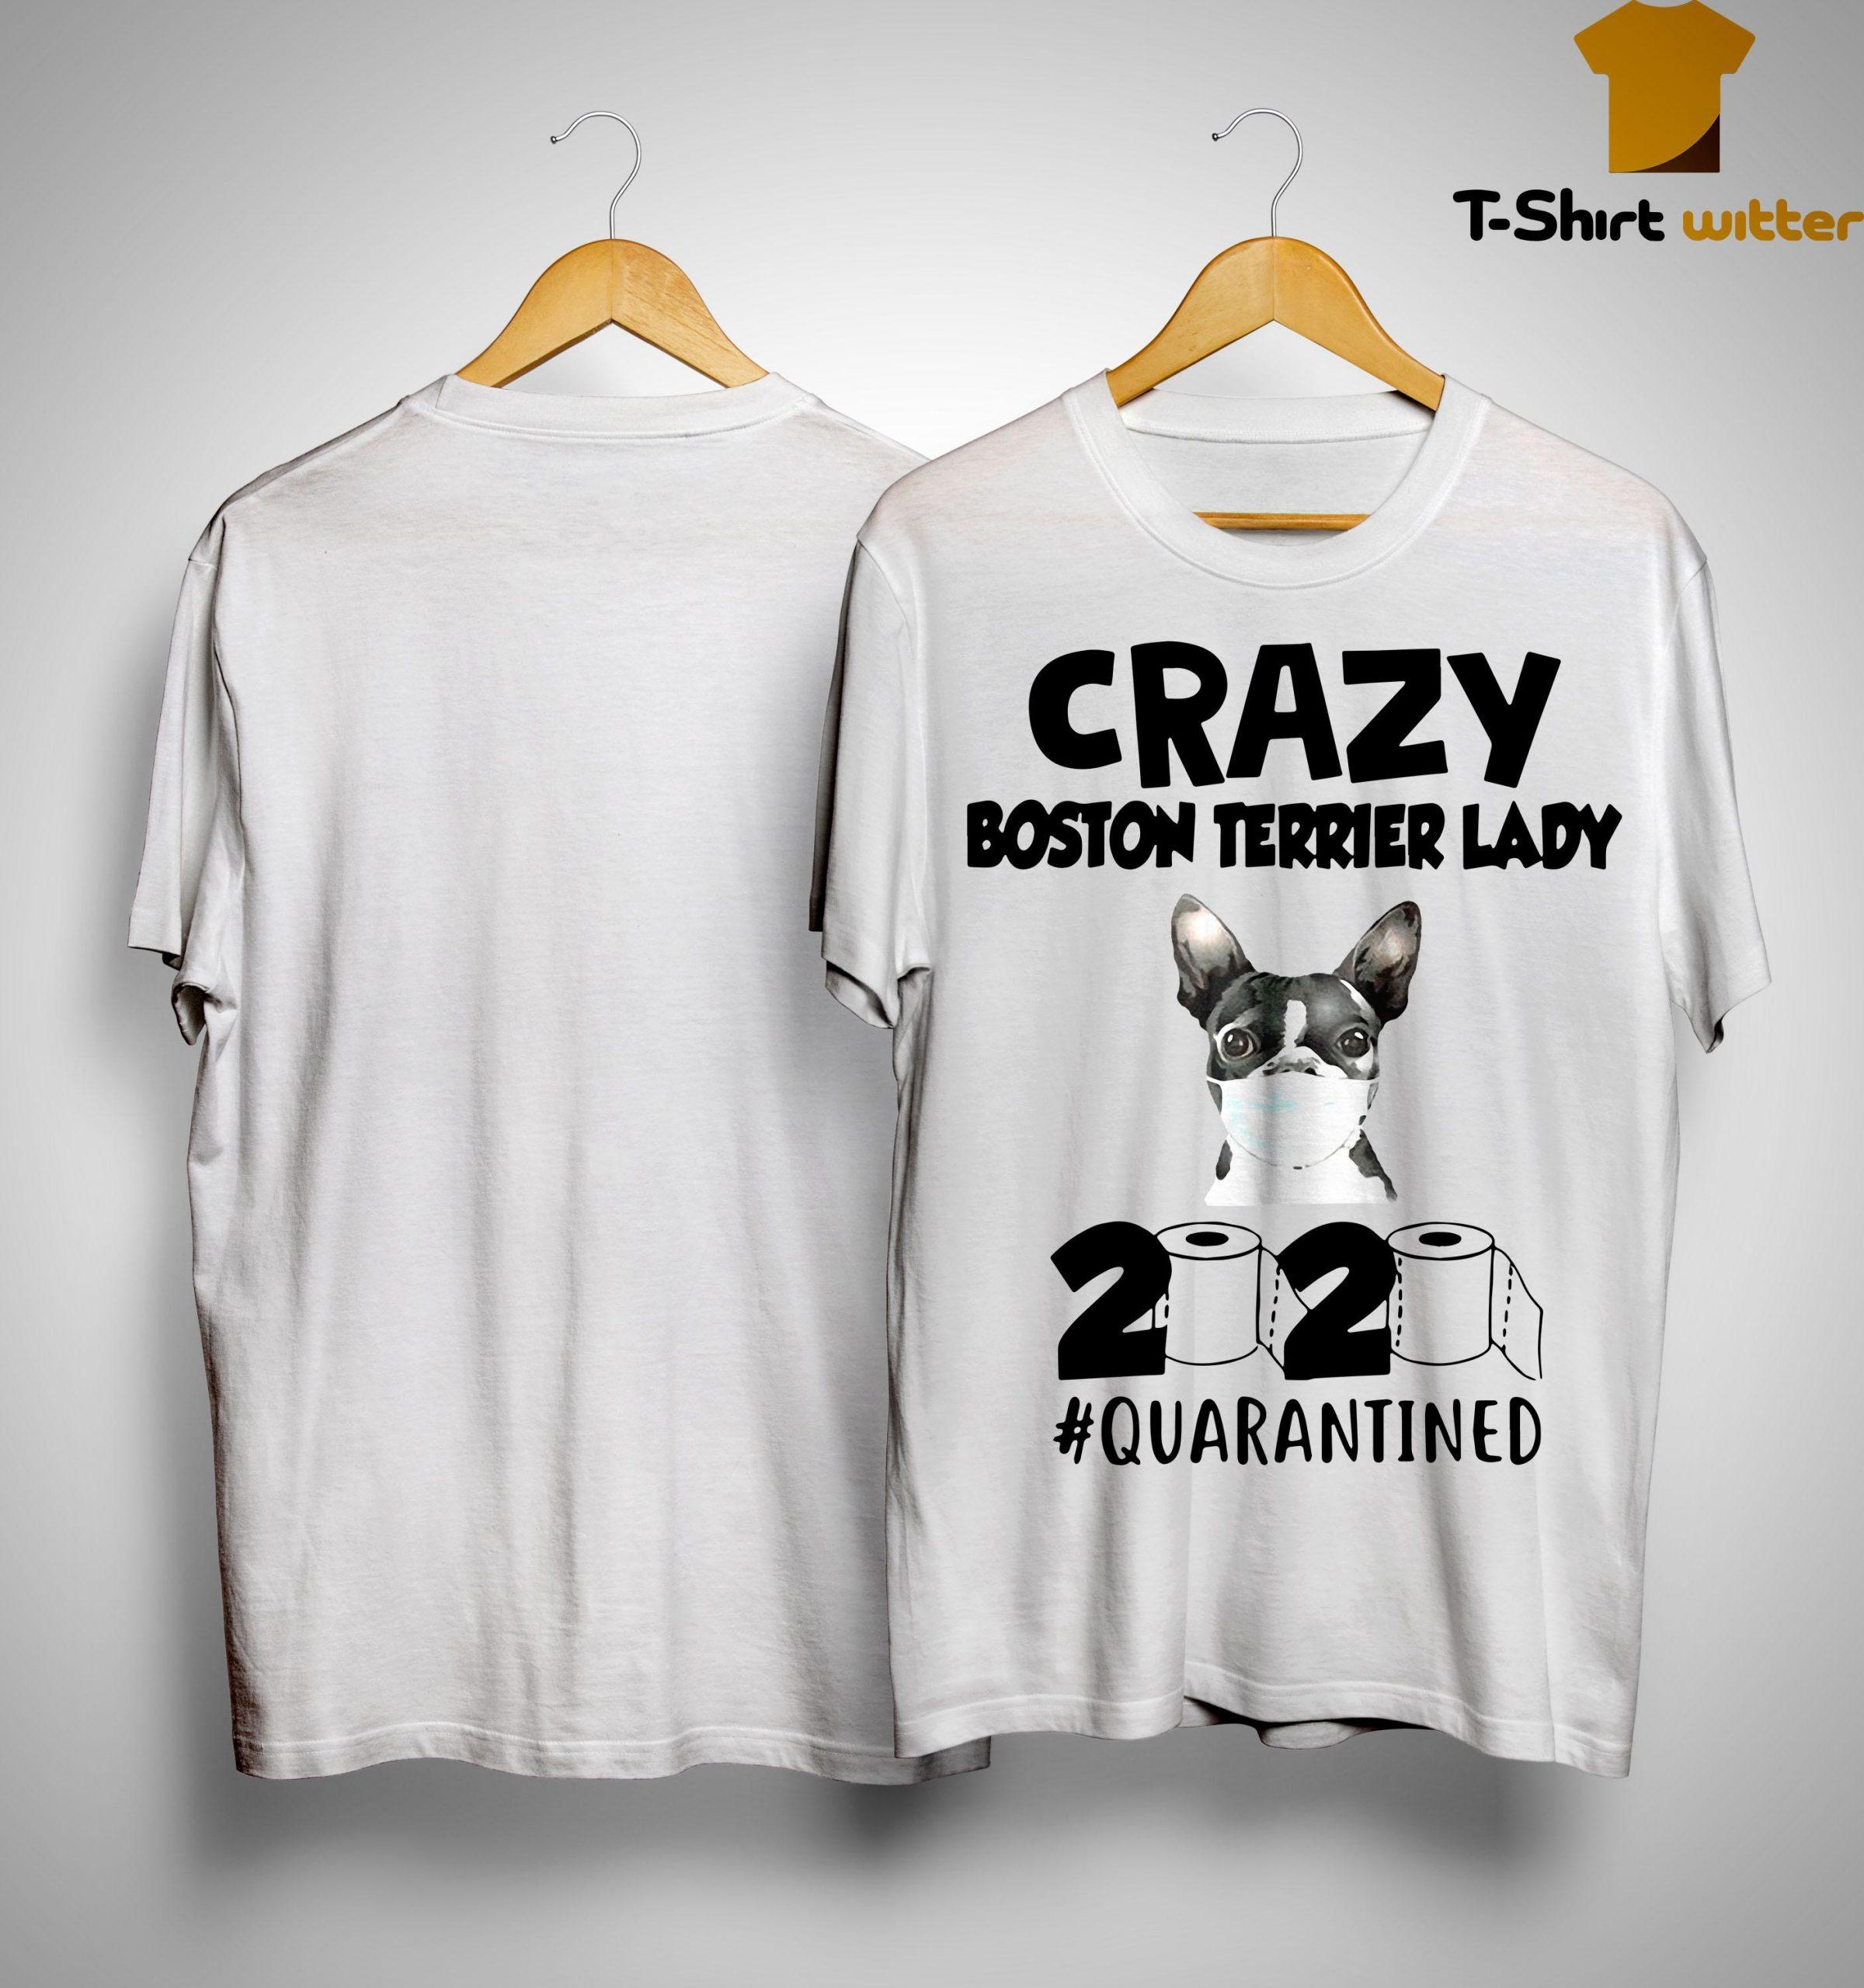 Crazy Boston Terrier Lady 2020 Quarantined Shirt